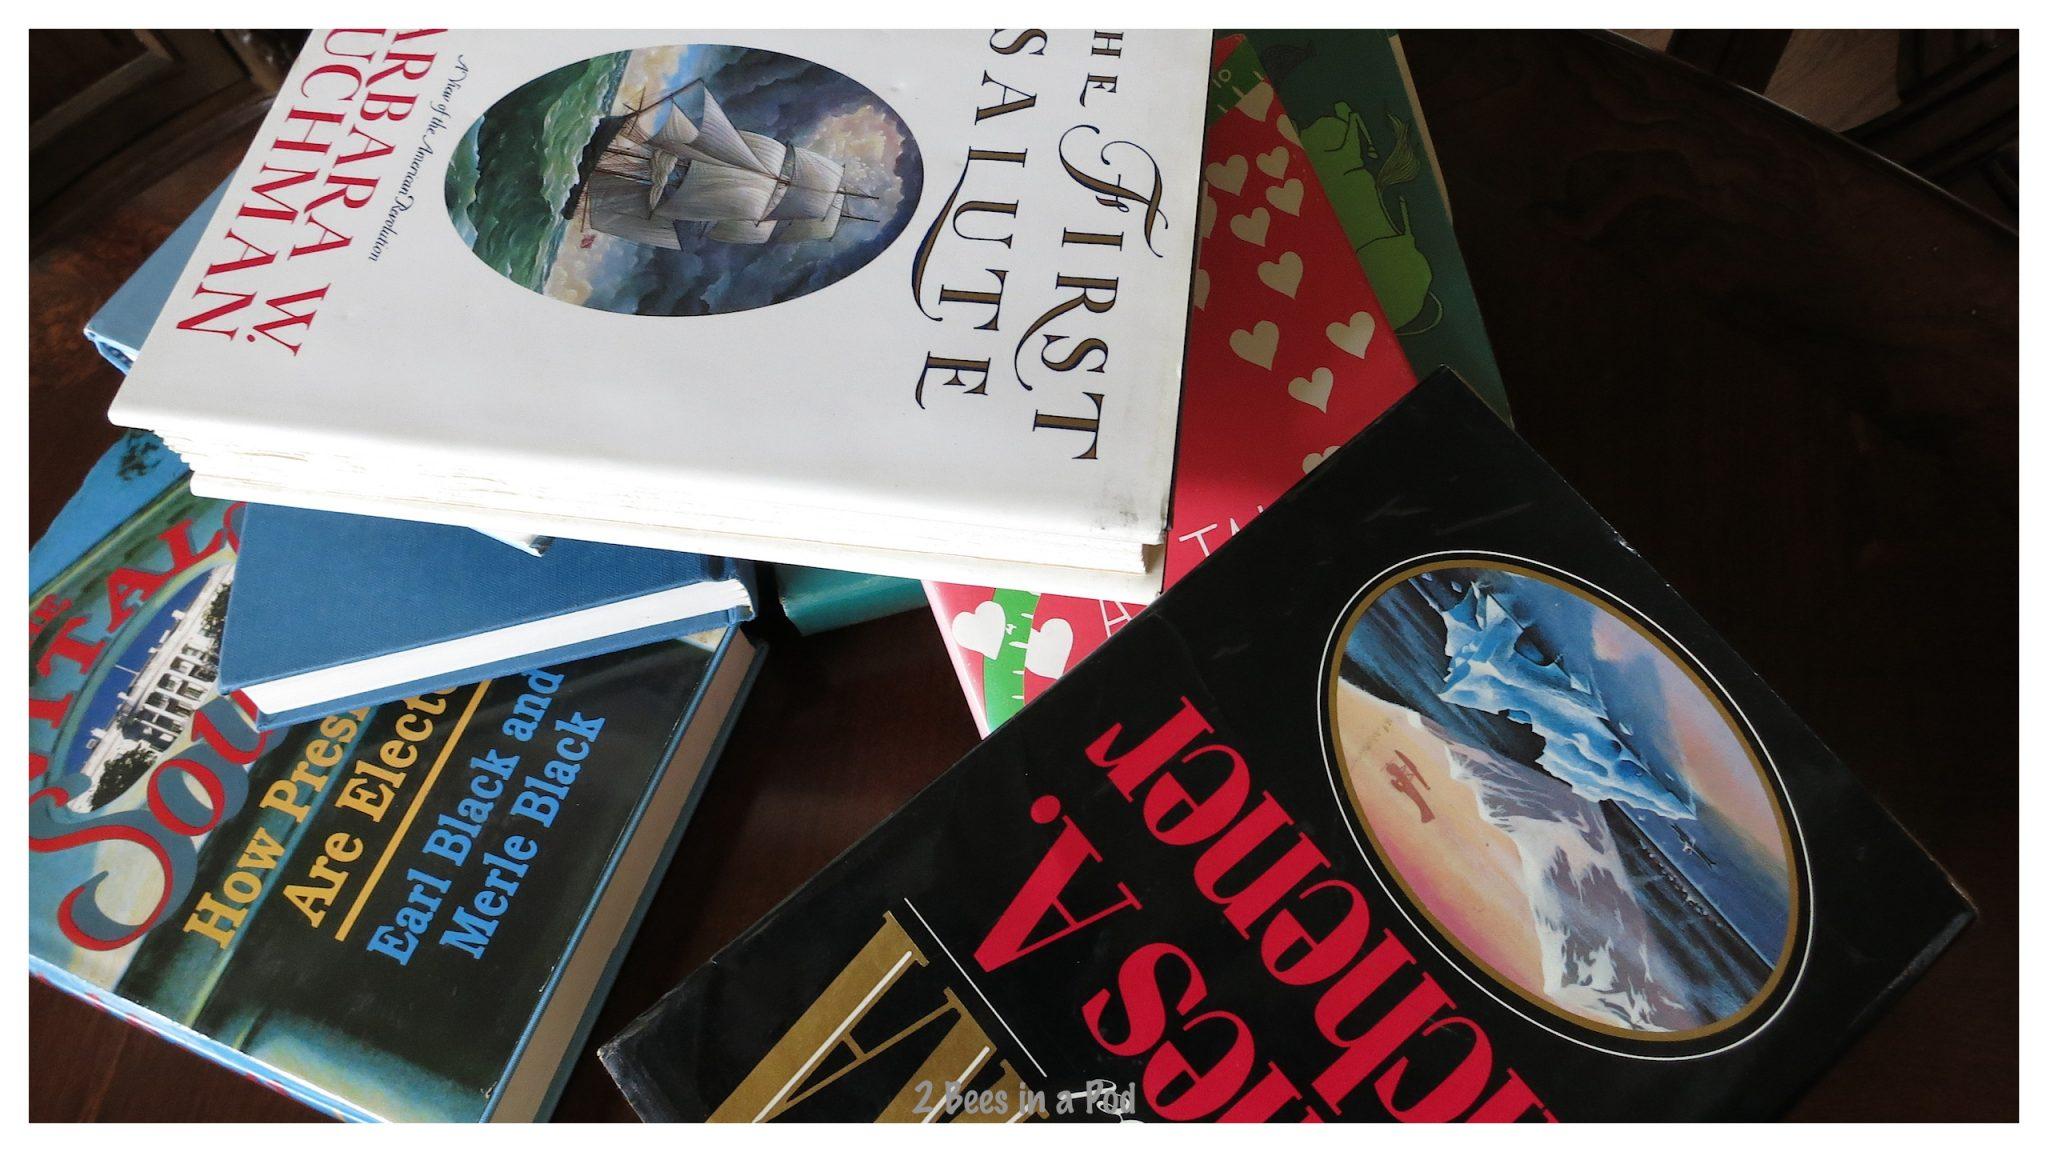 Book Pile - 25 cents each :)